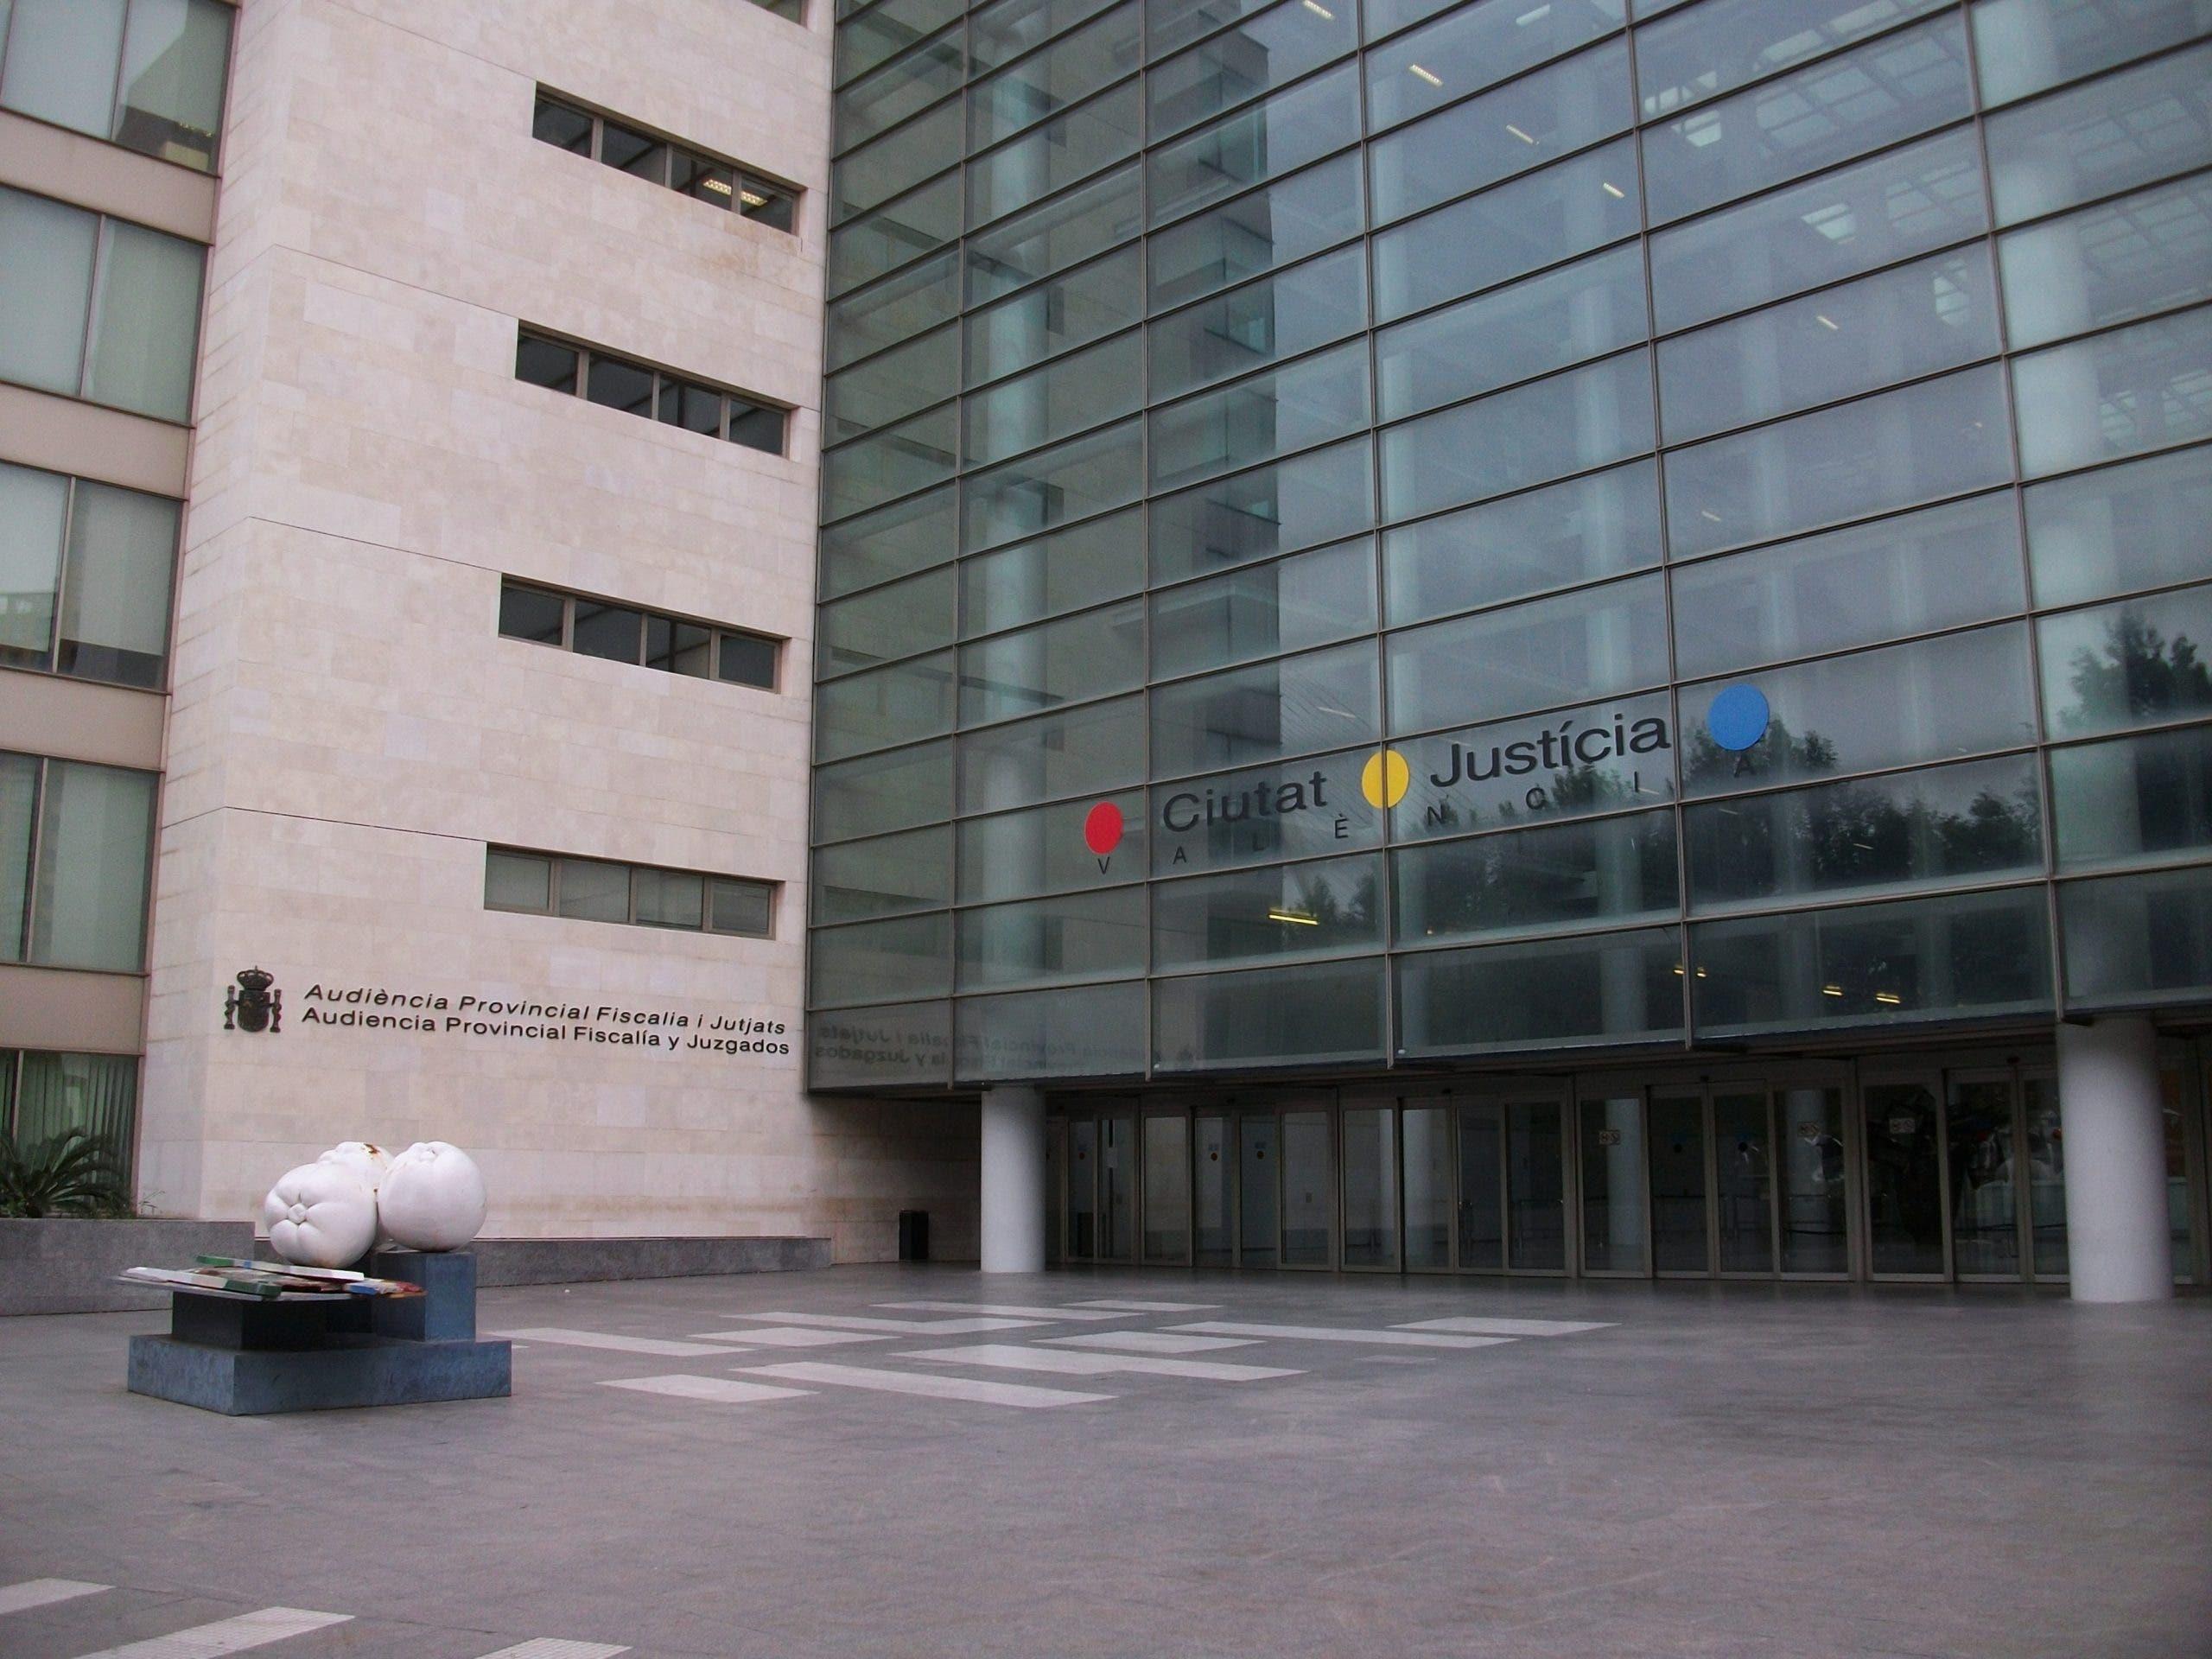 Valencia's Ciutat de la Justicia courts